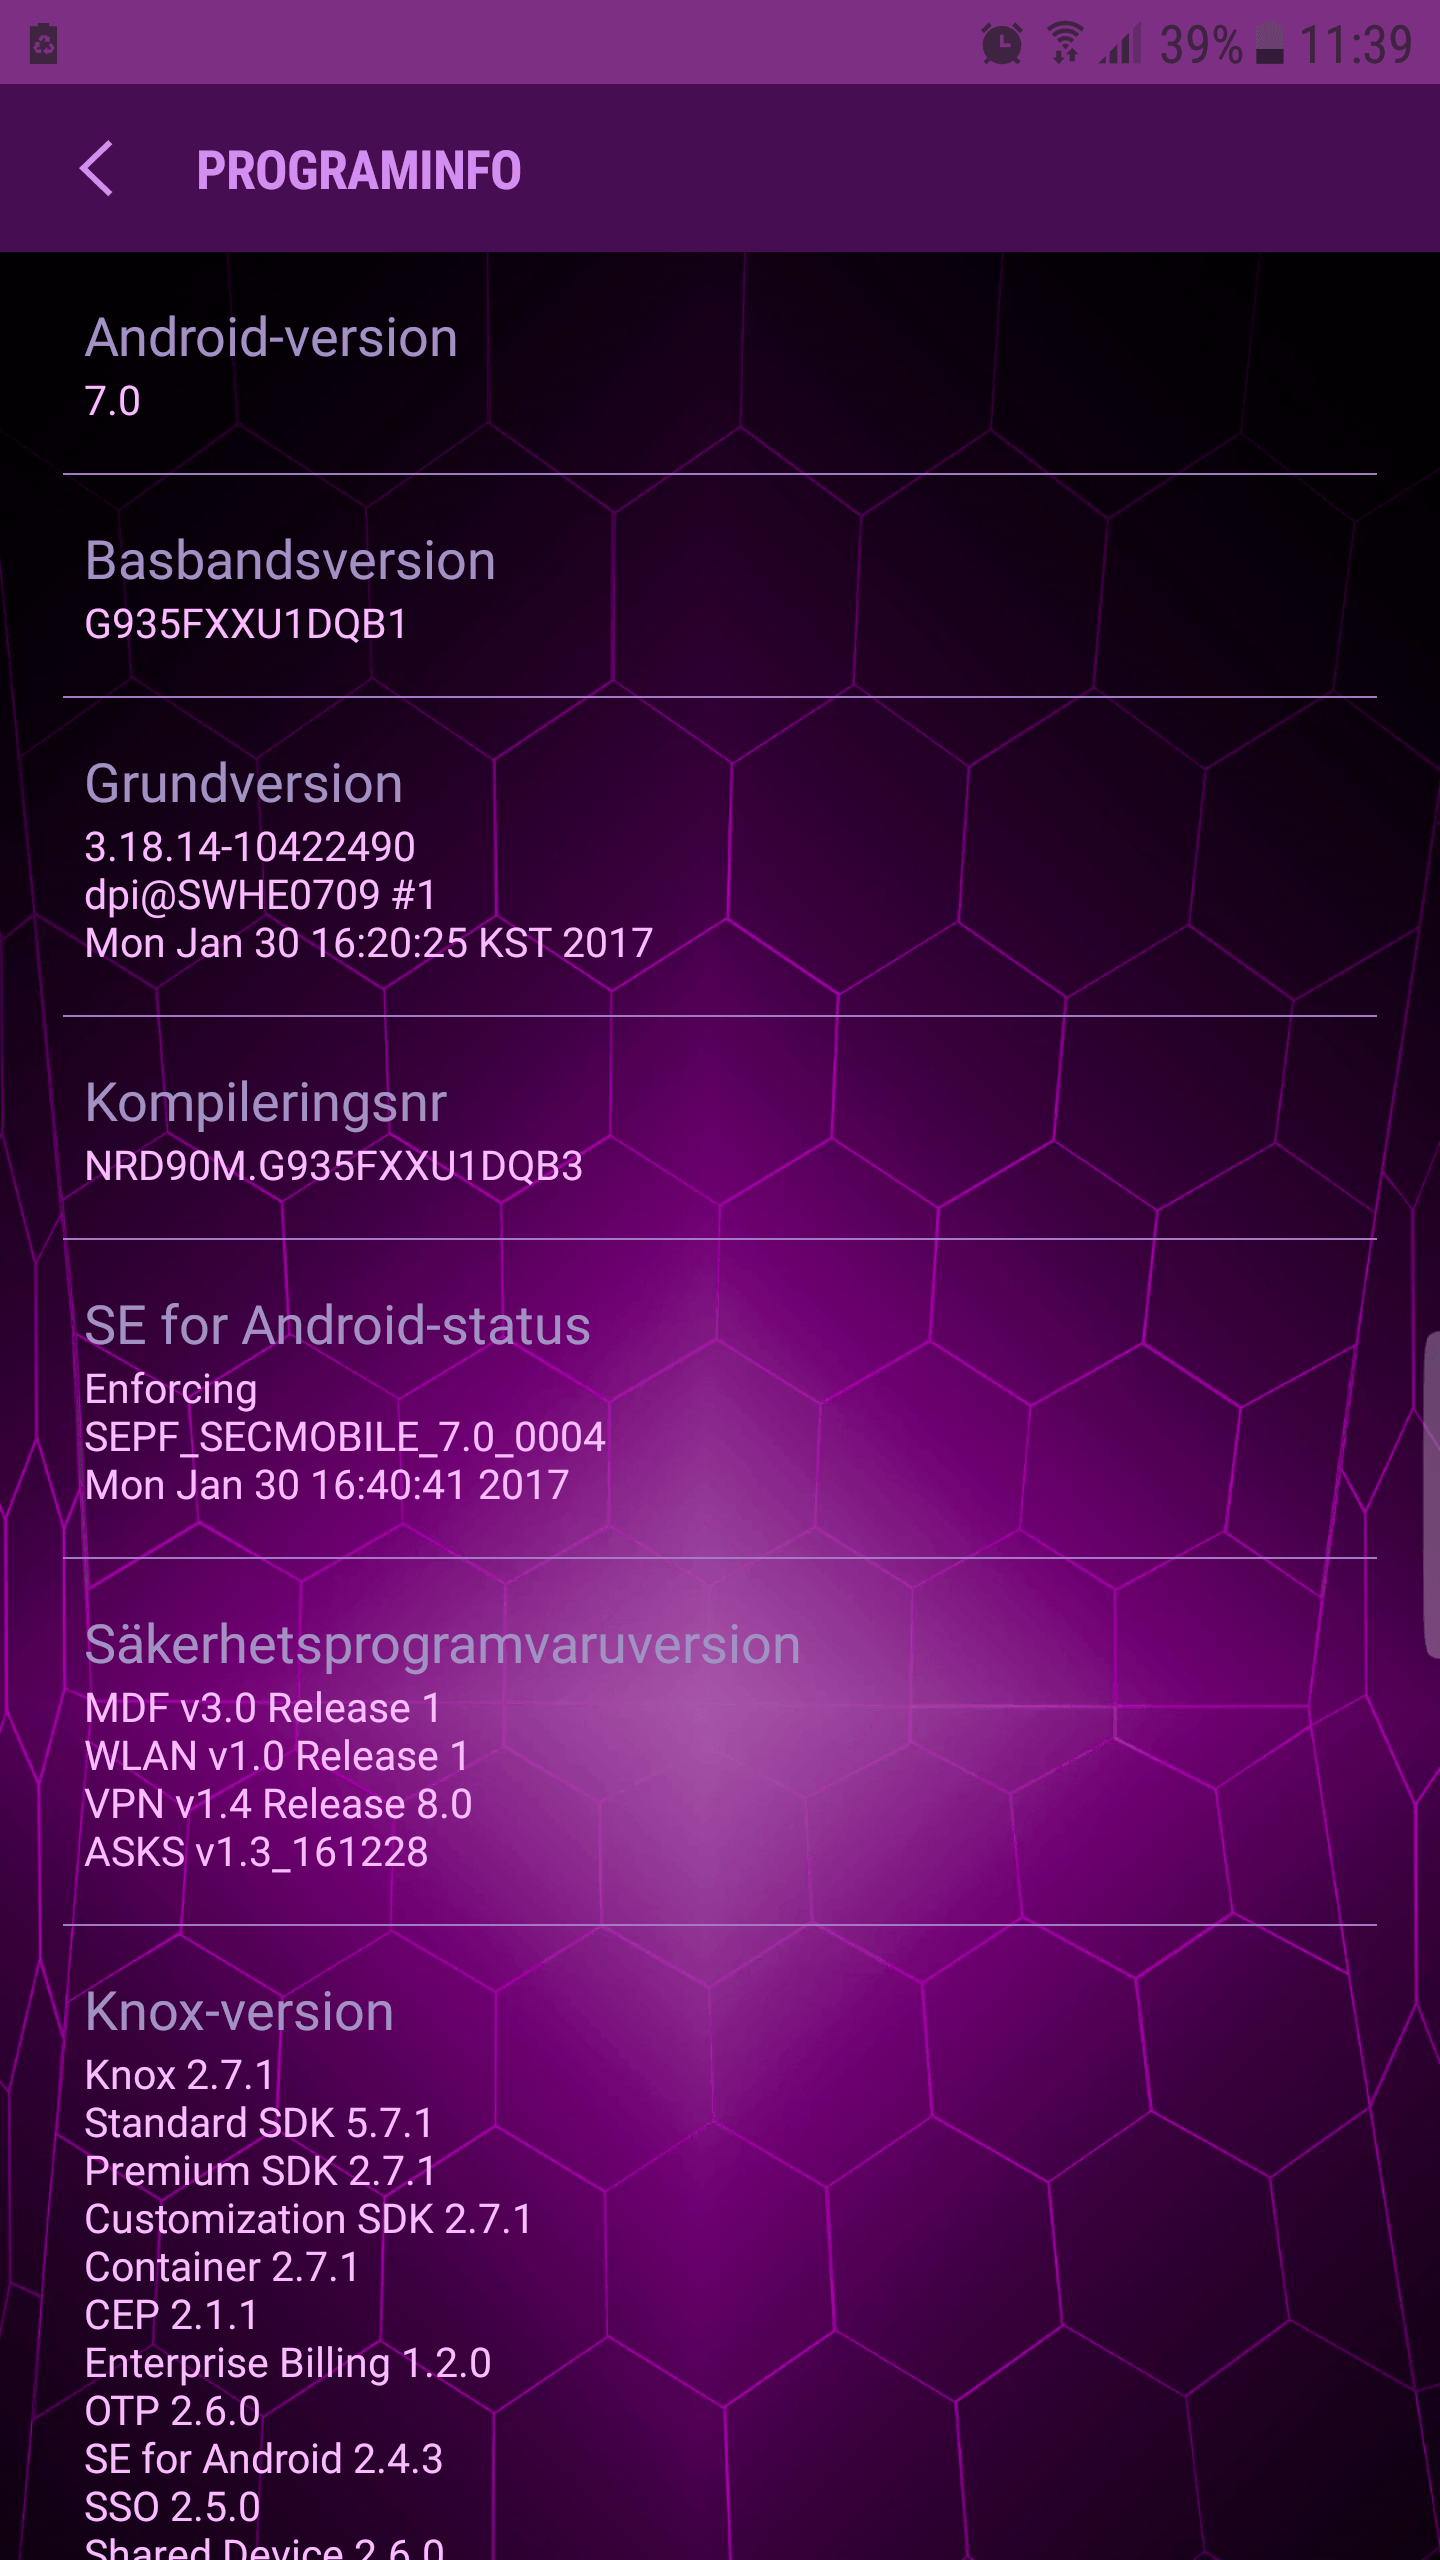 Screenshot_20170211-113917.png